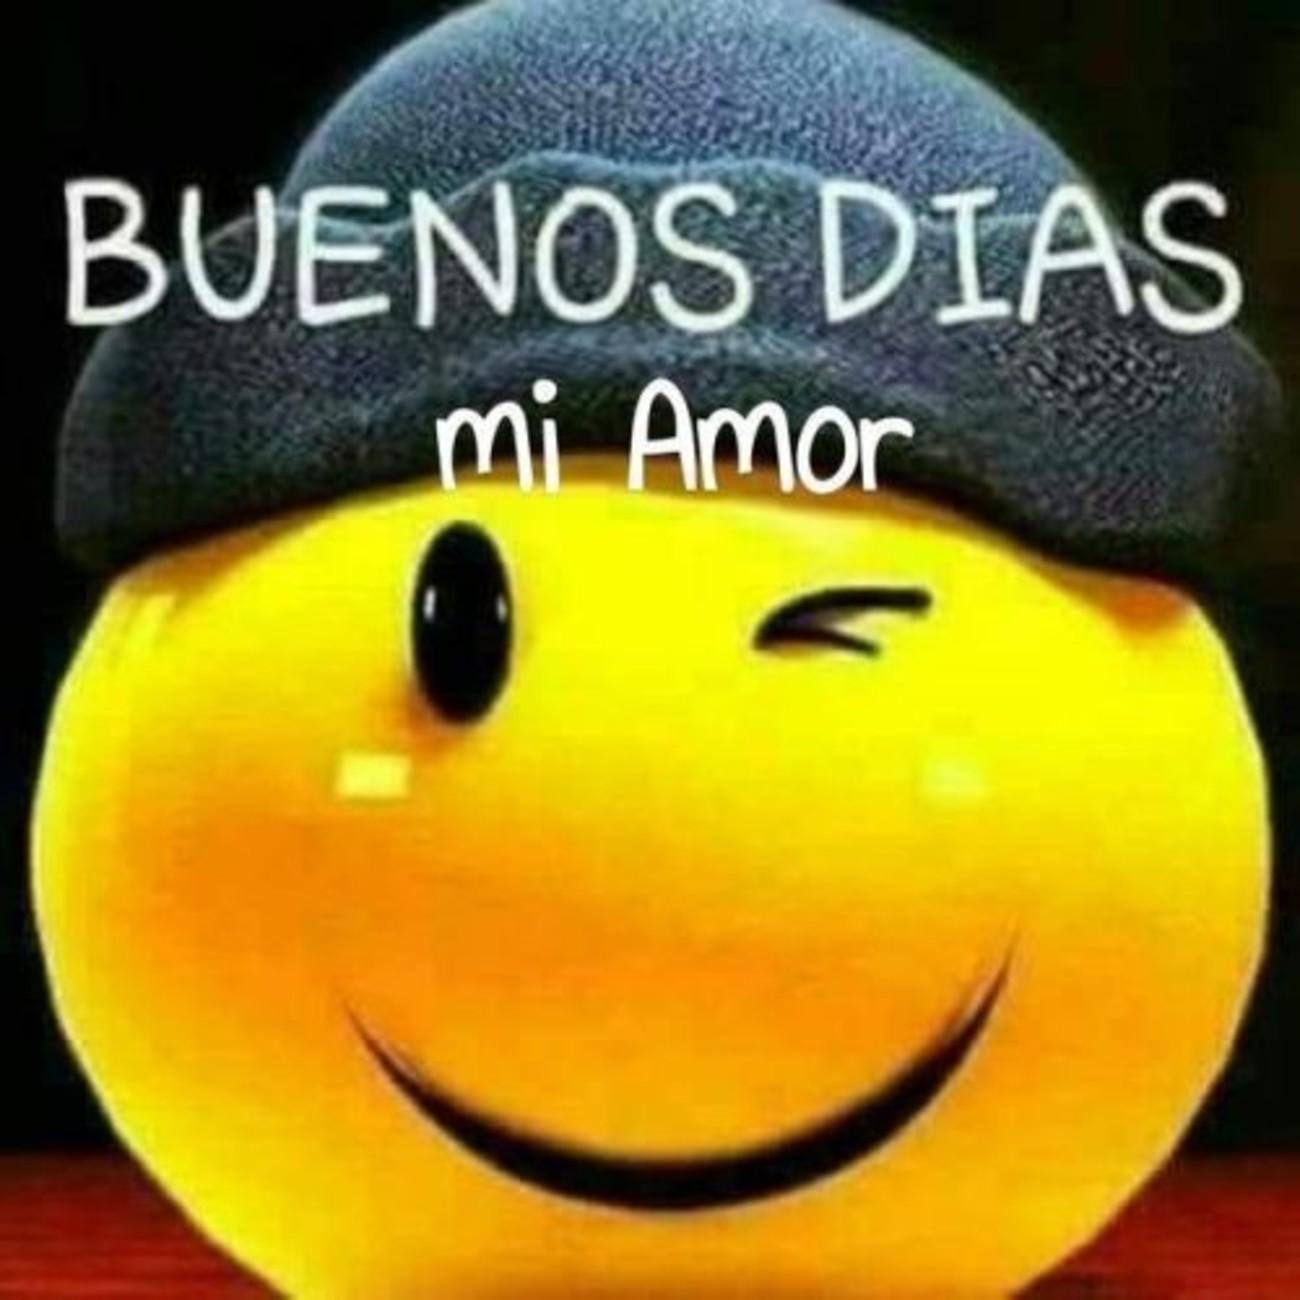 Buenos Dias mi amor 619